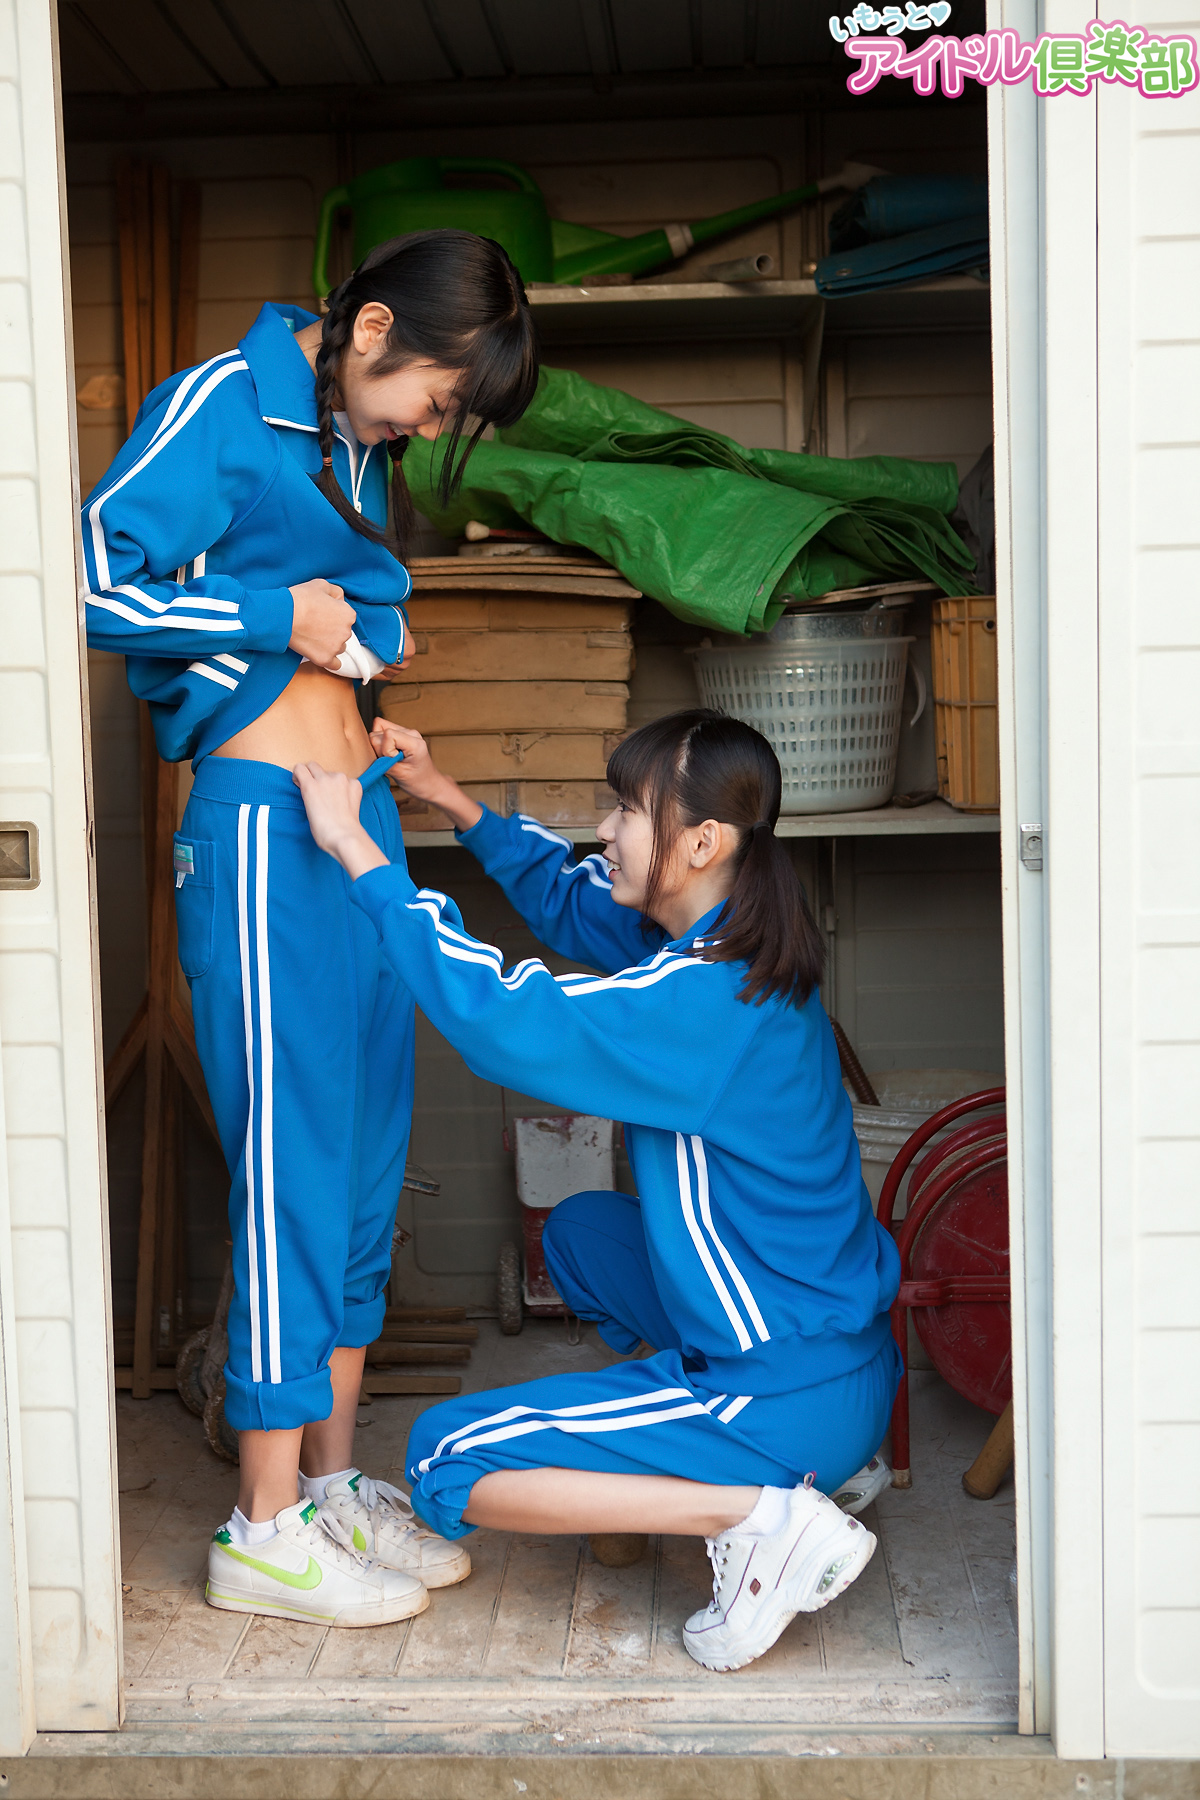 gravure promotion pictures, Makihara Ayu (牧原あゆ), Shiina Momo ...